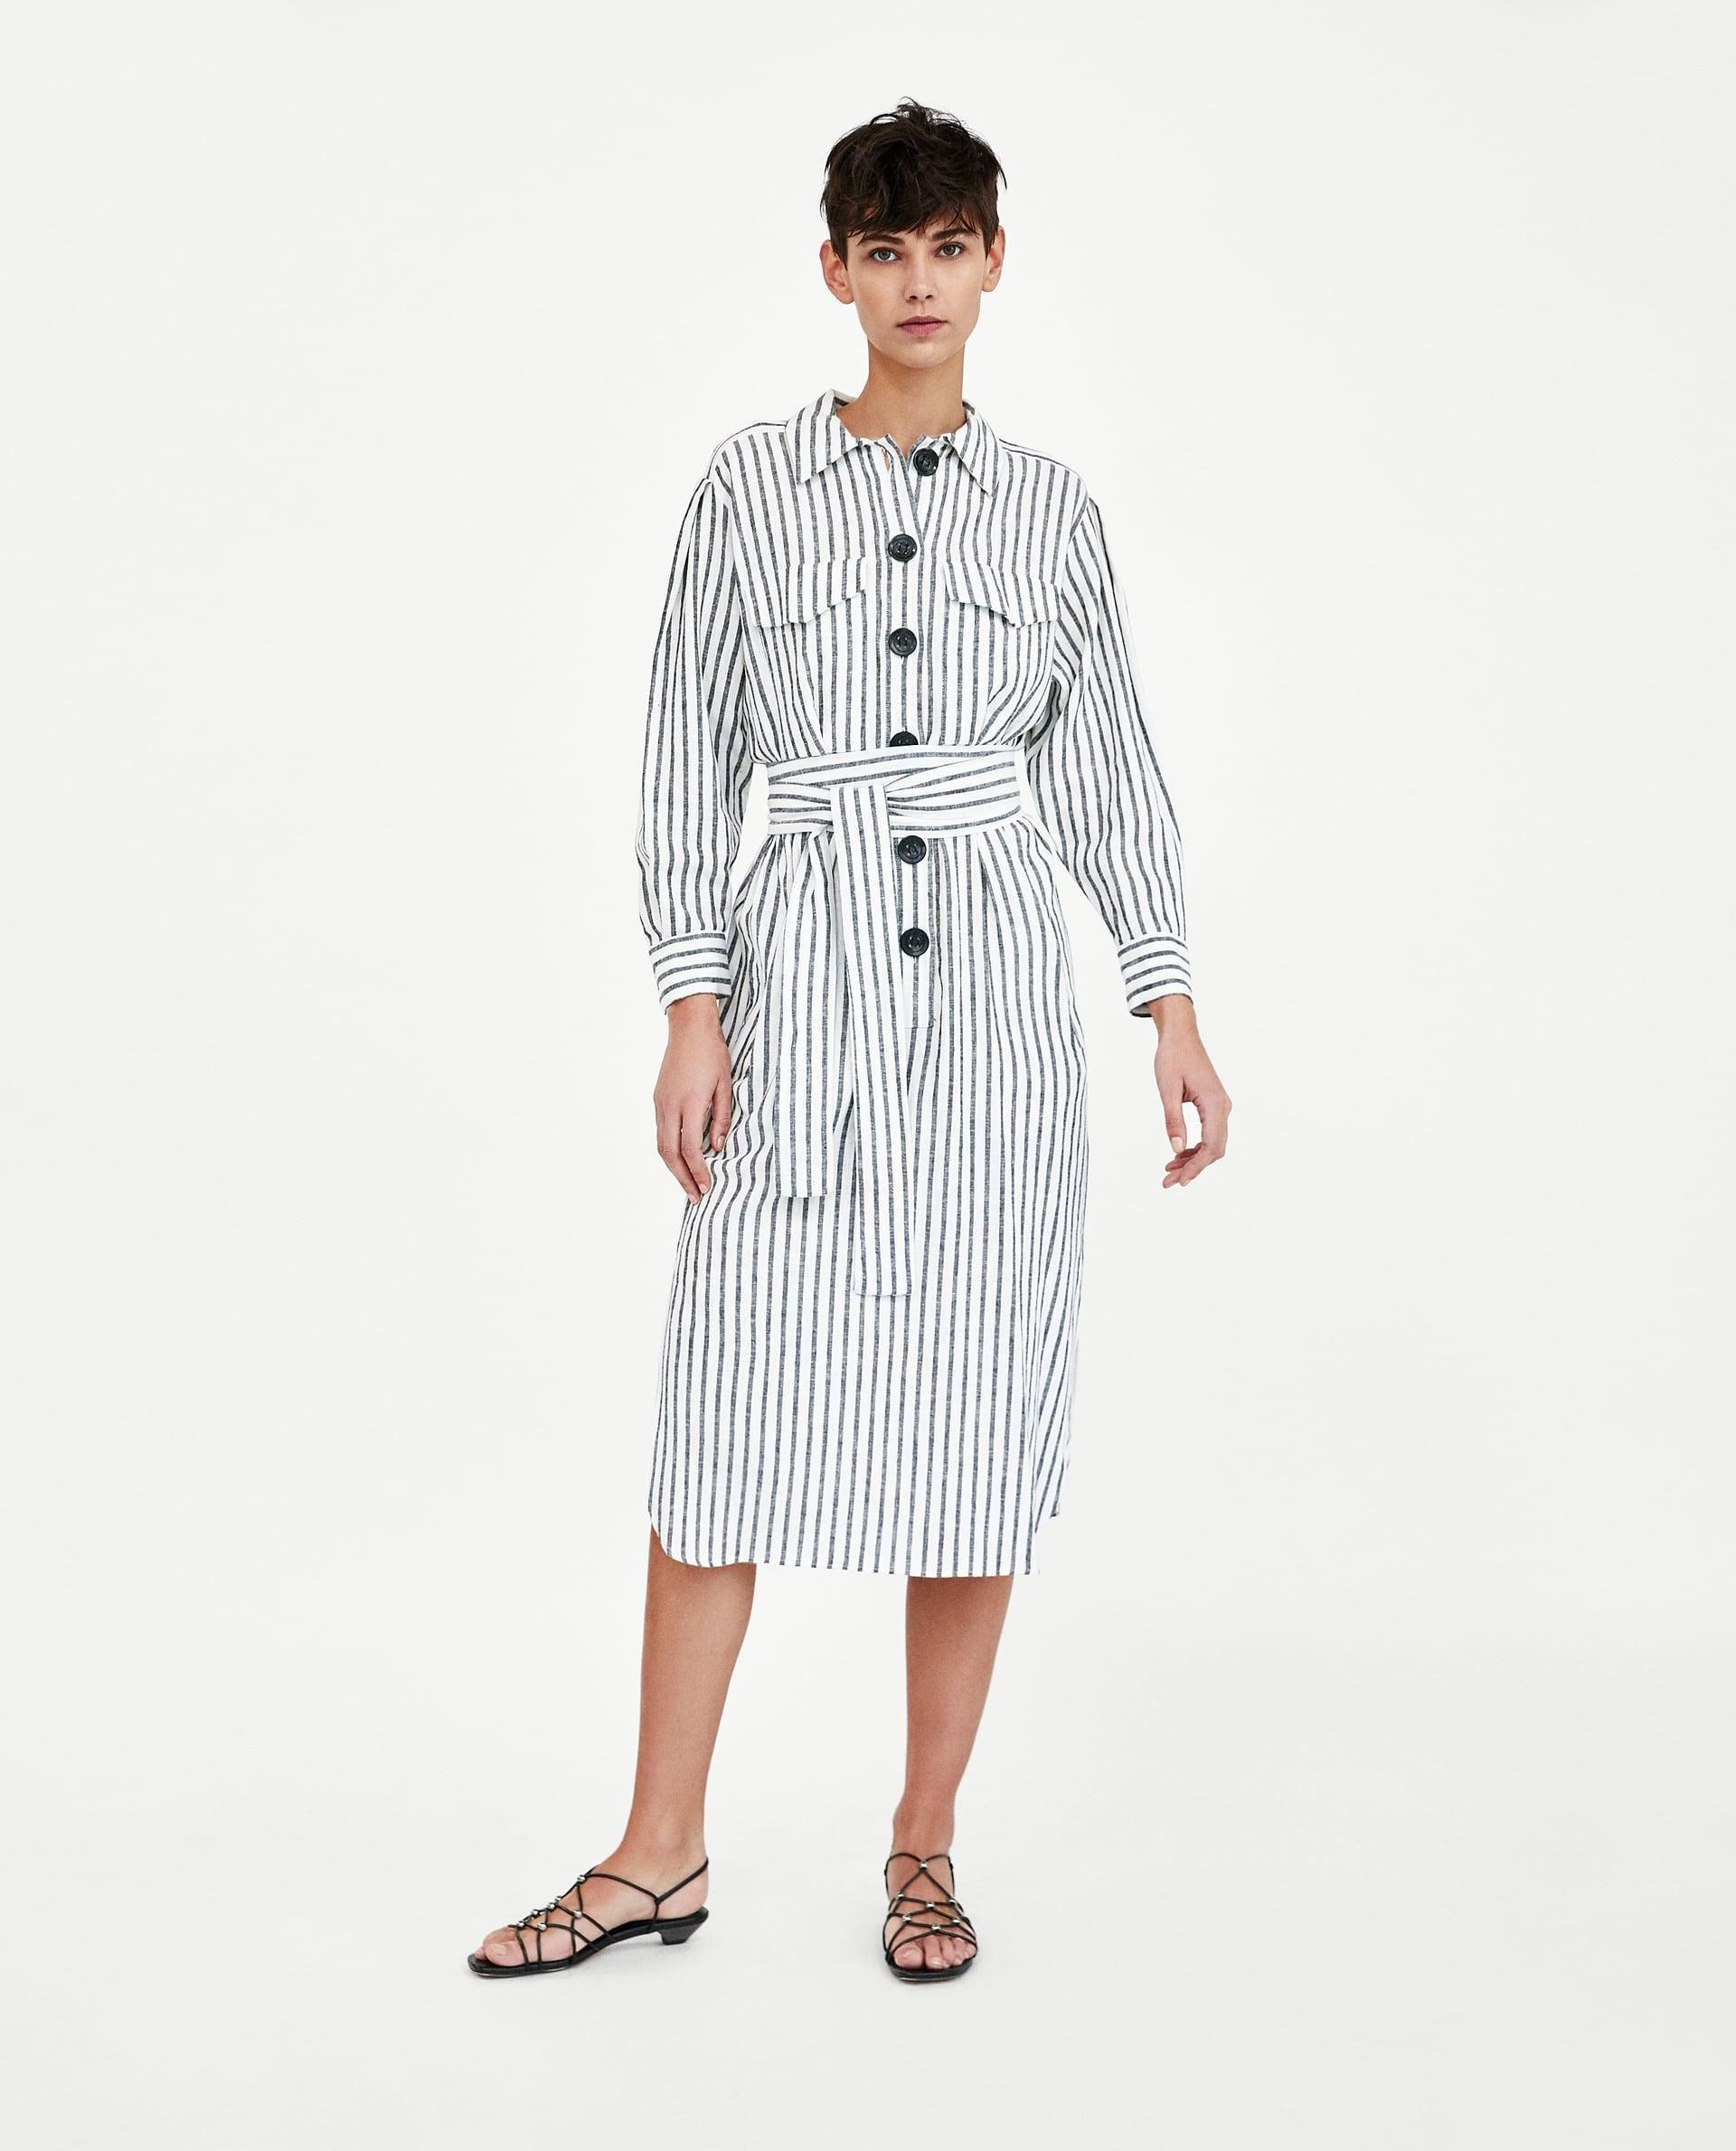 4ff14f55846 Striped Linen Dress    69.90 USD    Zara    Collared shirt dress with